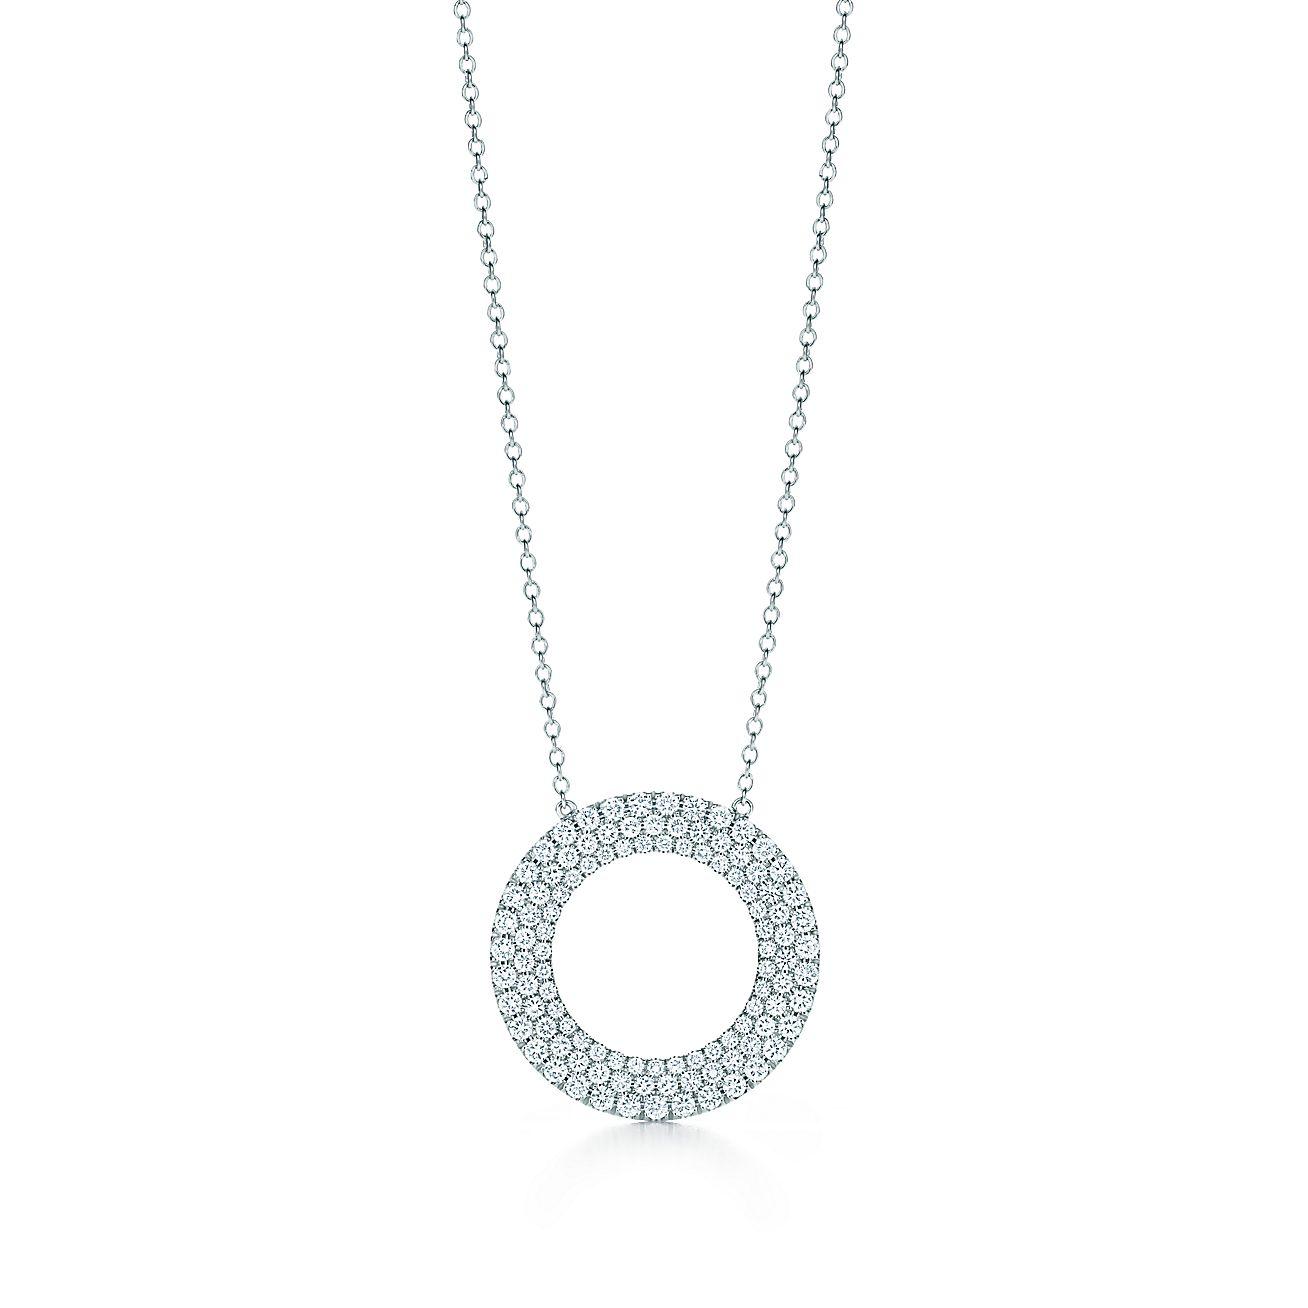 Tiffany Metro:Three-row Circle Pendant